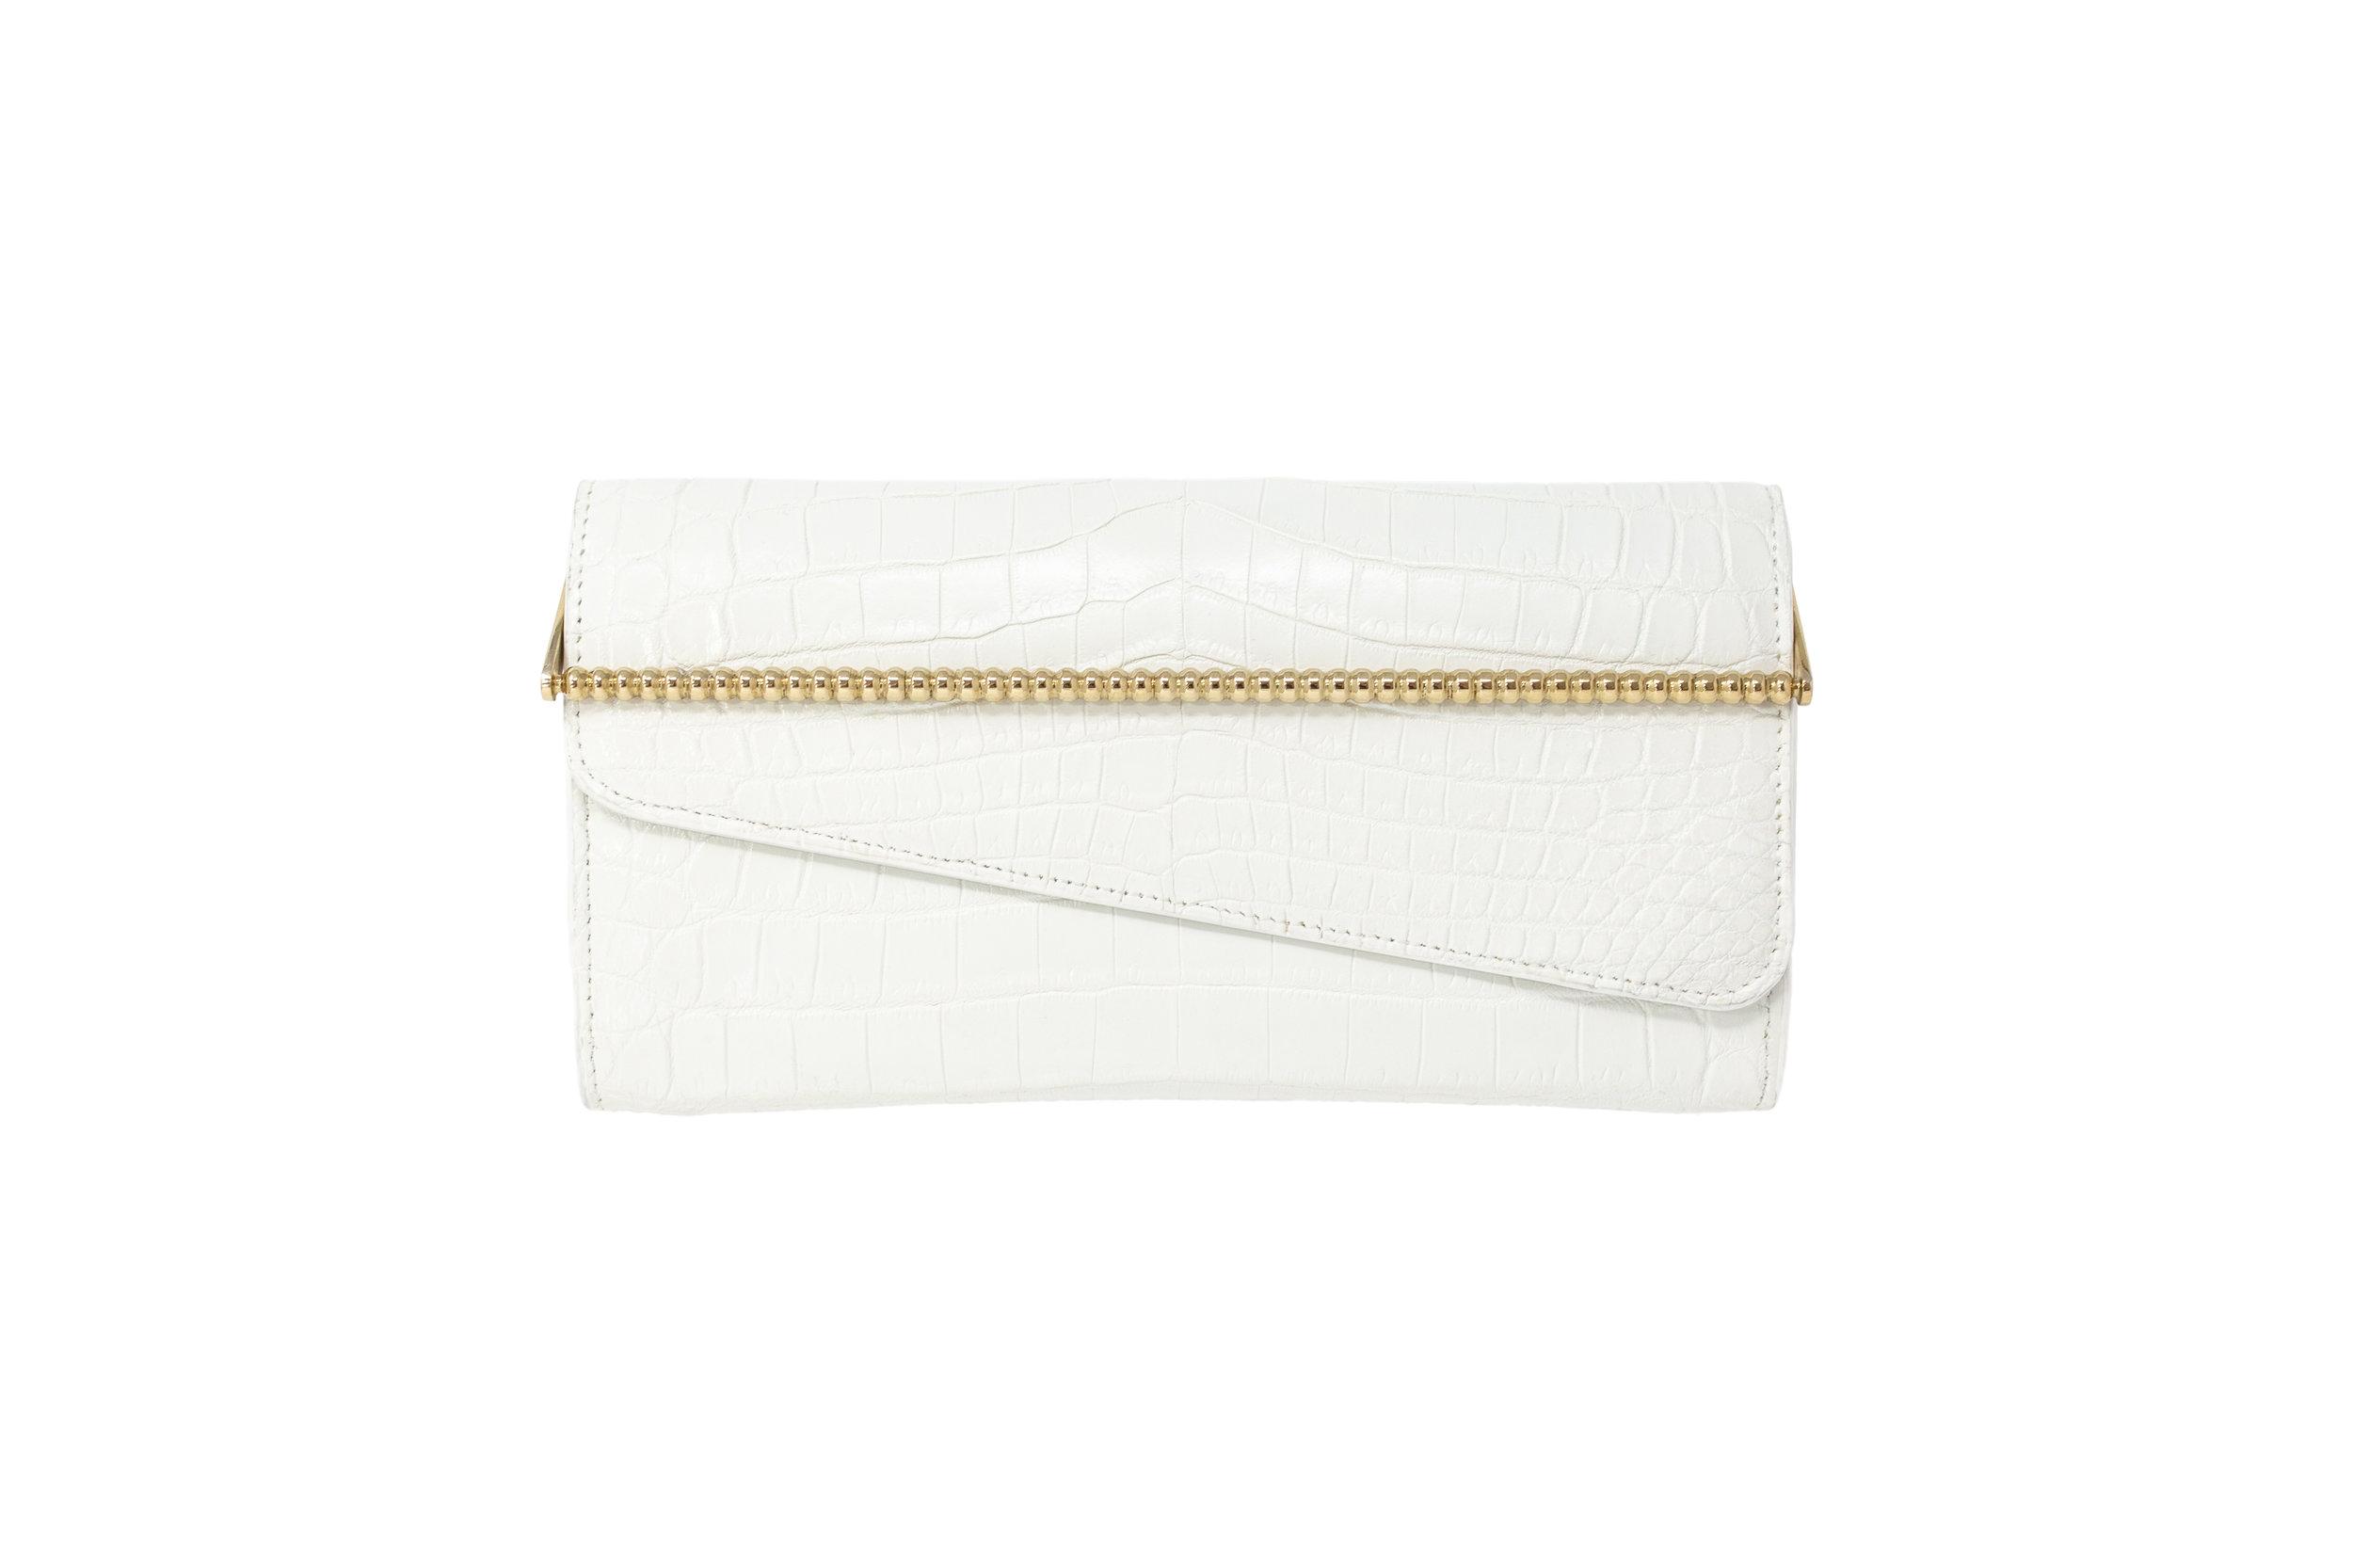 Calie Parese Luxury Crocodile Womens Wallet White